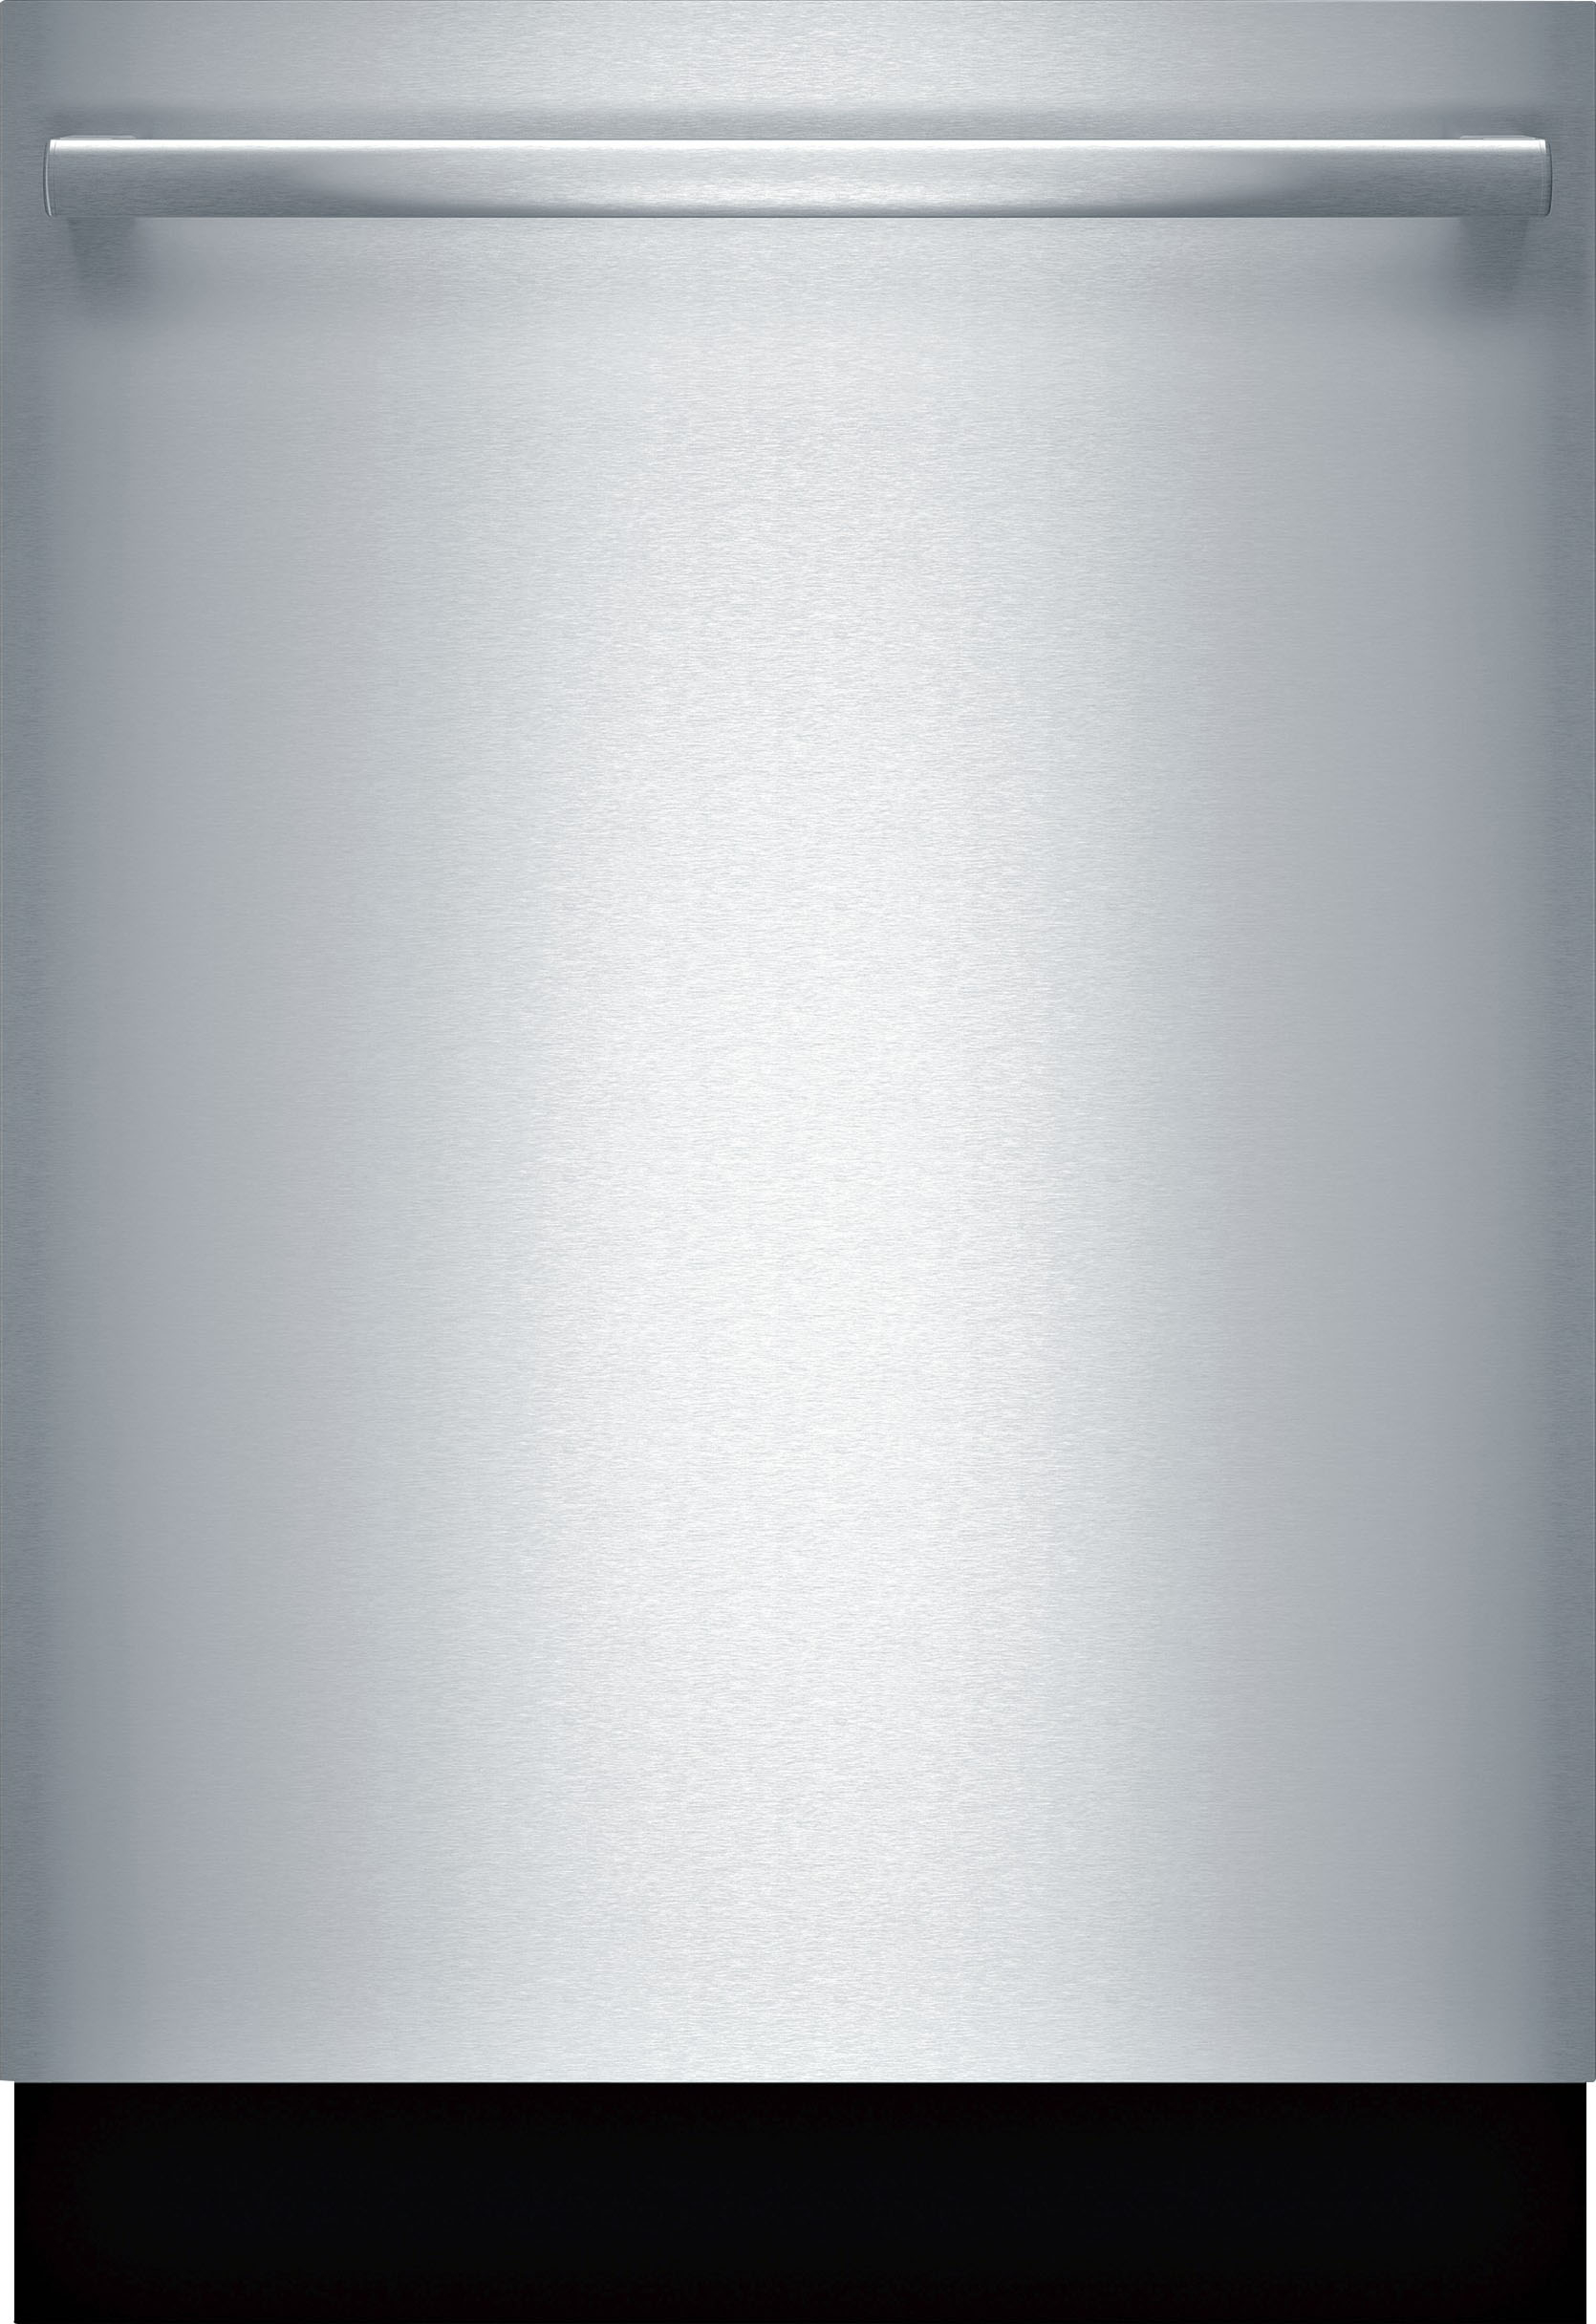 Bosch Dishwasher Top Rack : bosch, dishwasher, Bosch, Series, Control, Built-In, Dishwasher, CrystalDry,, Stainless, Steel, Rack,, SHXM78Z55N